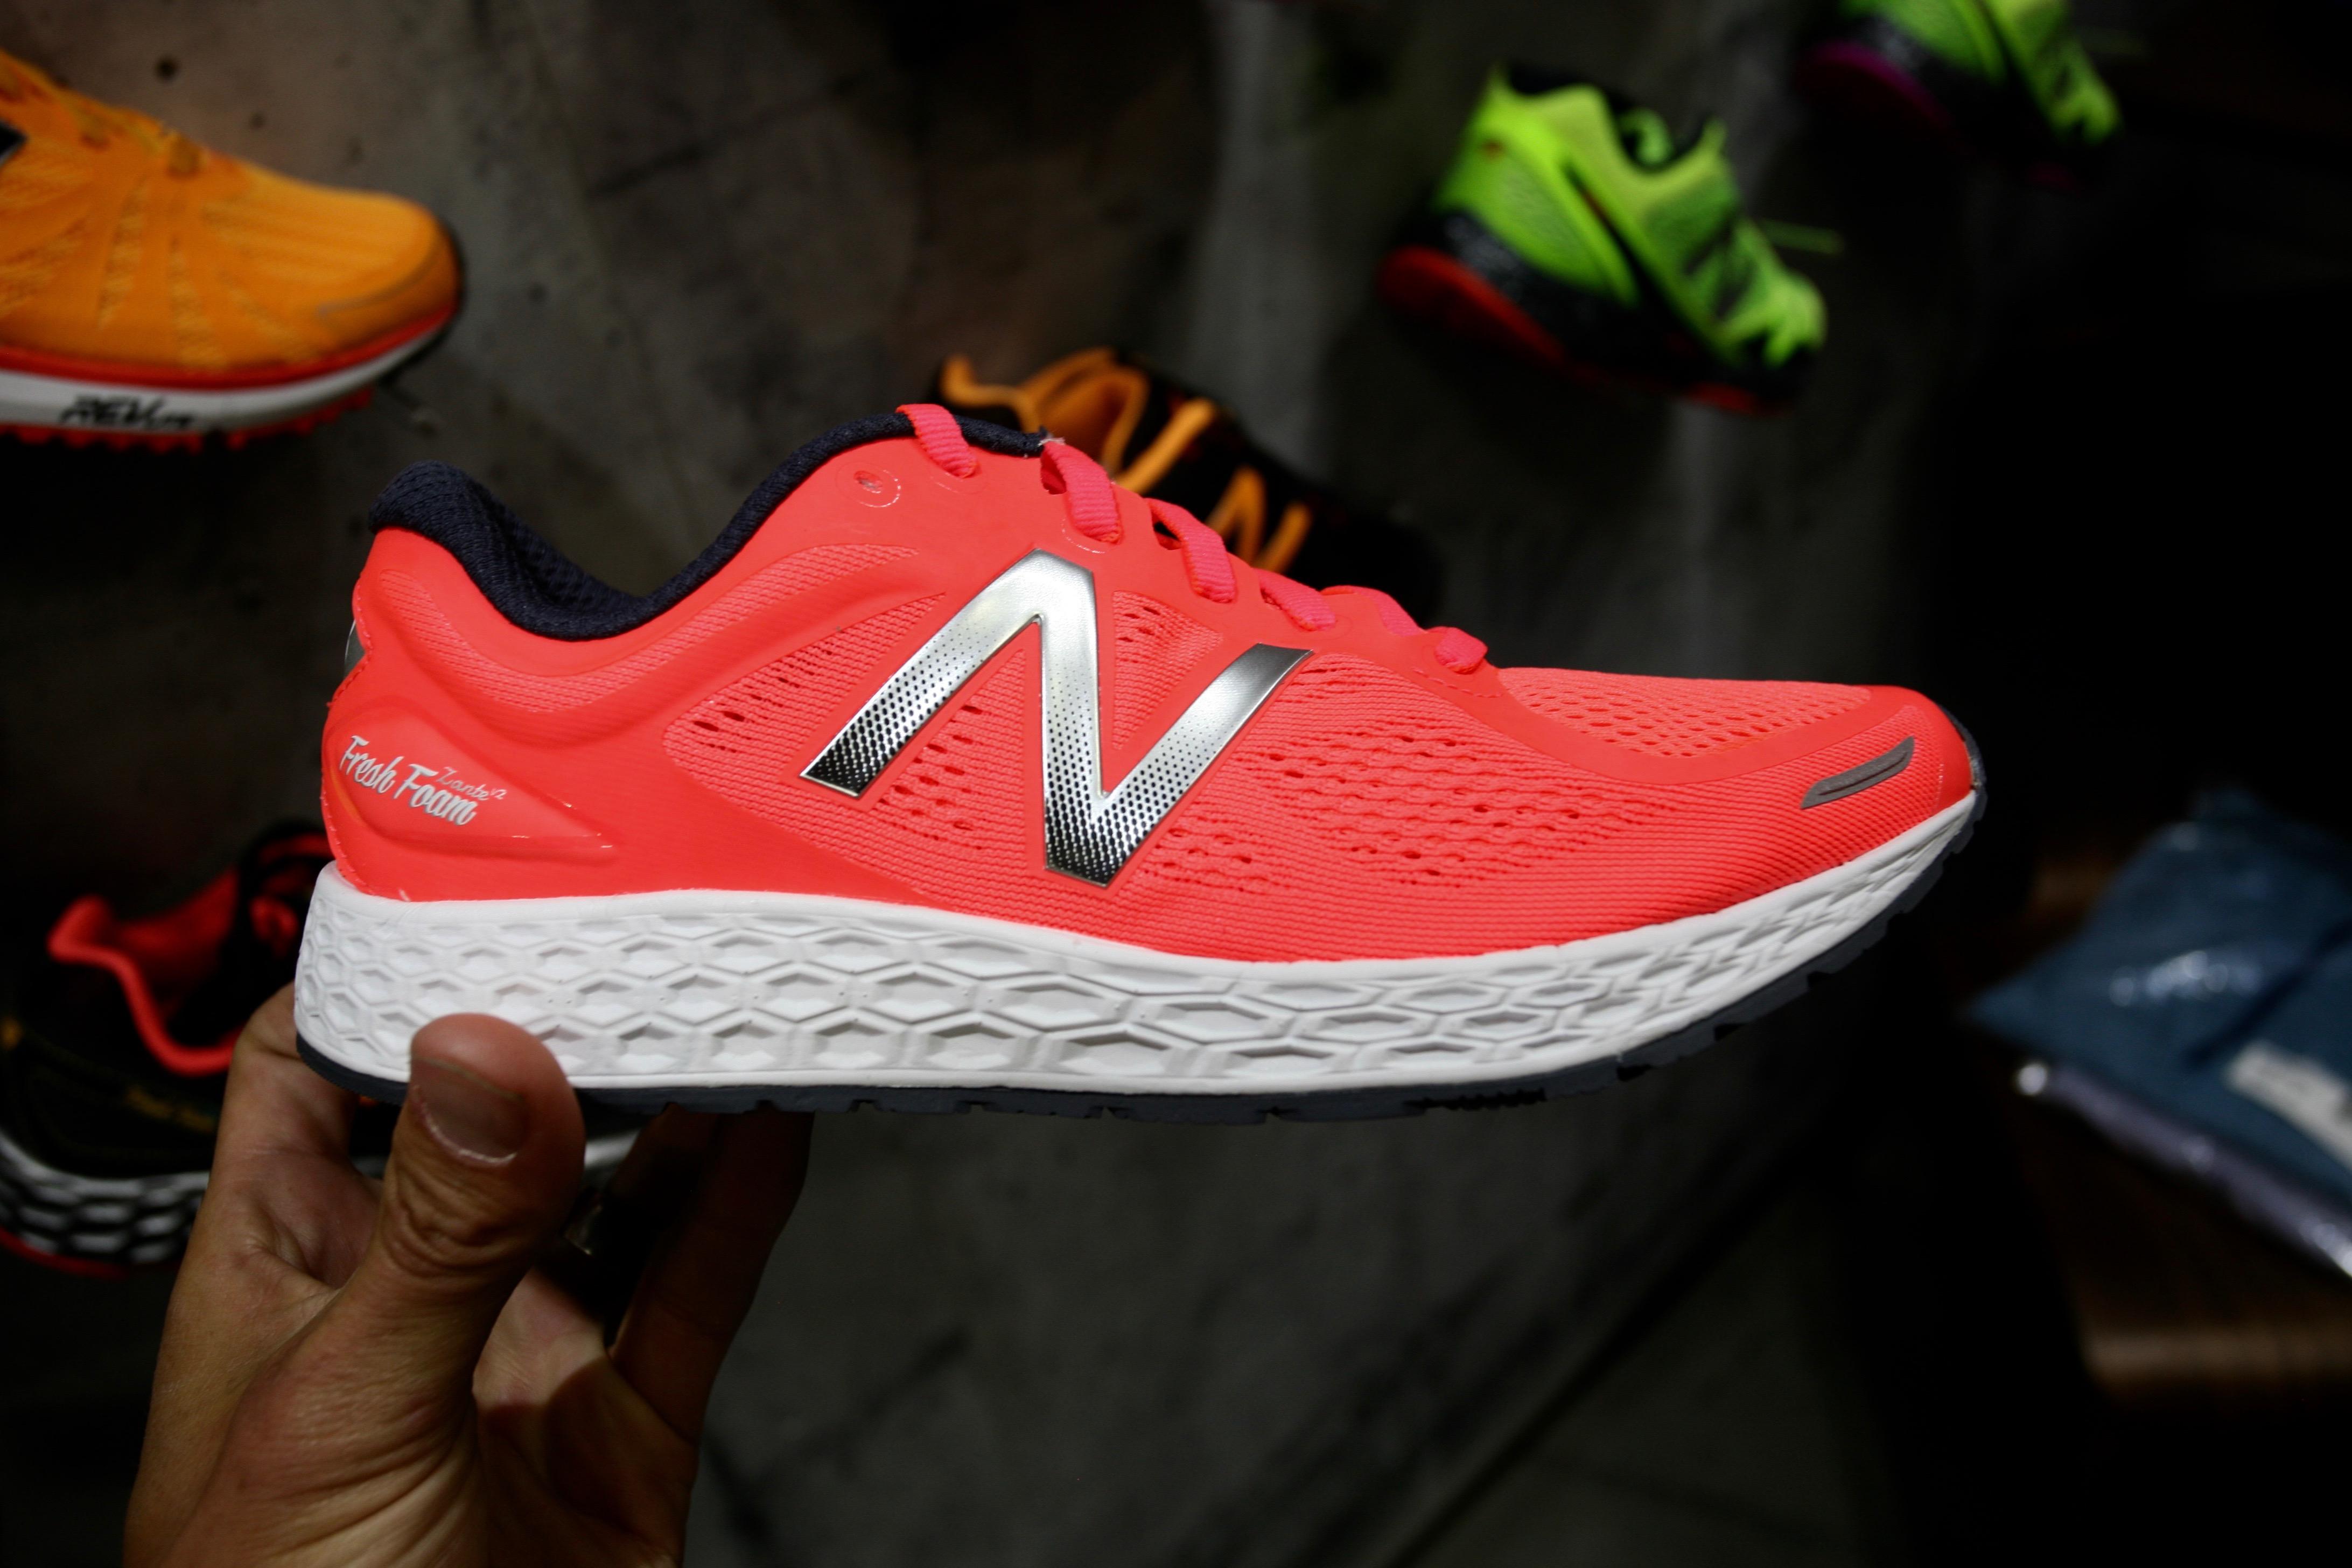 Running Shoes According To Terrain